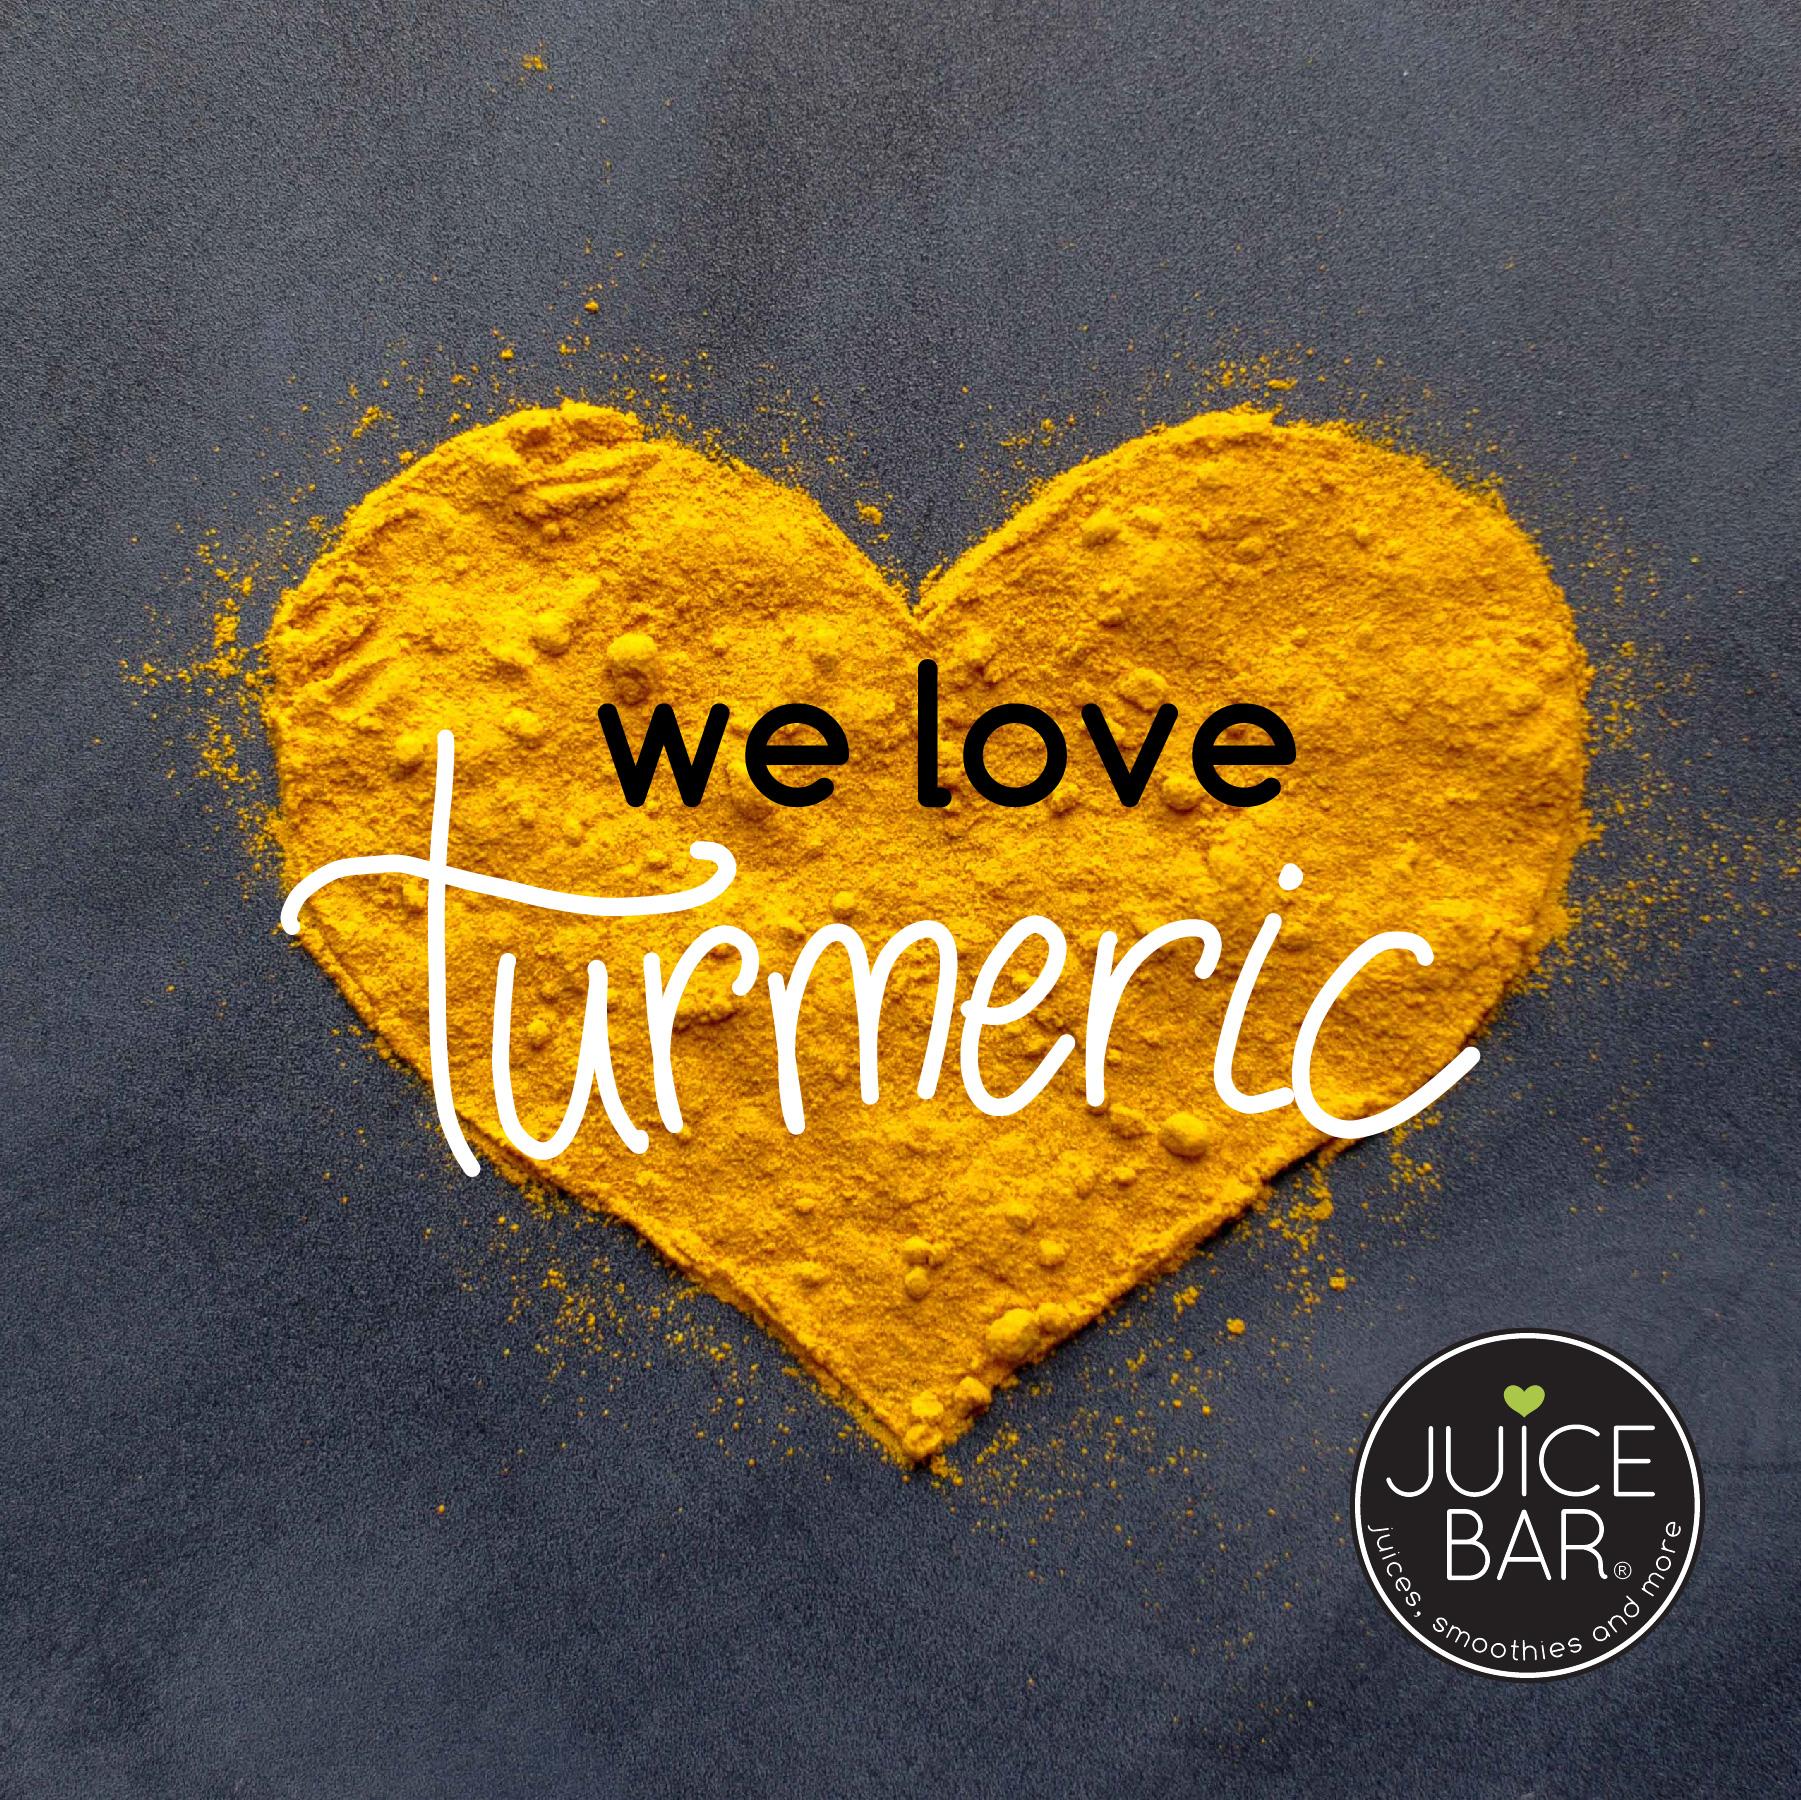 We love turmeric!